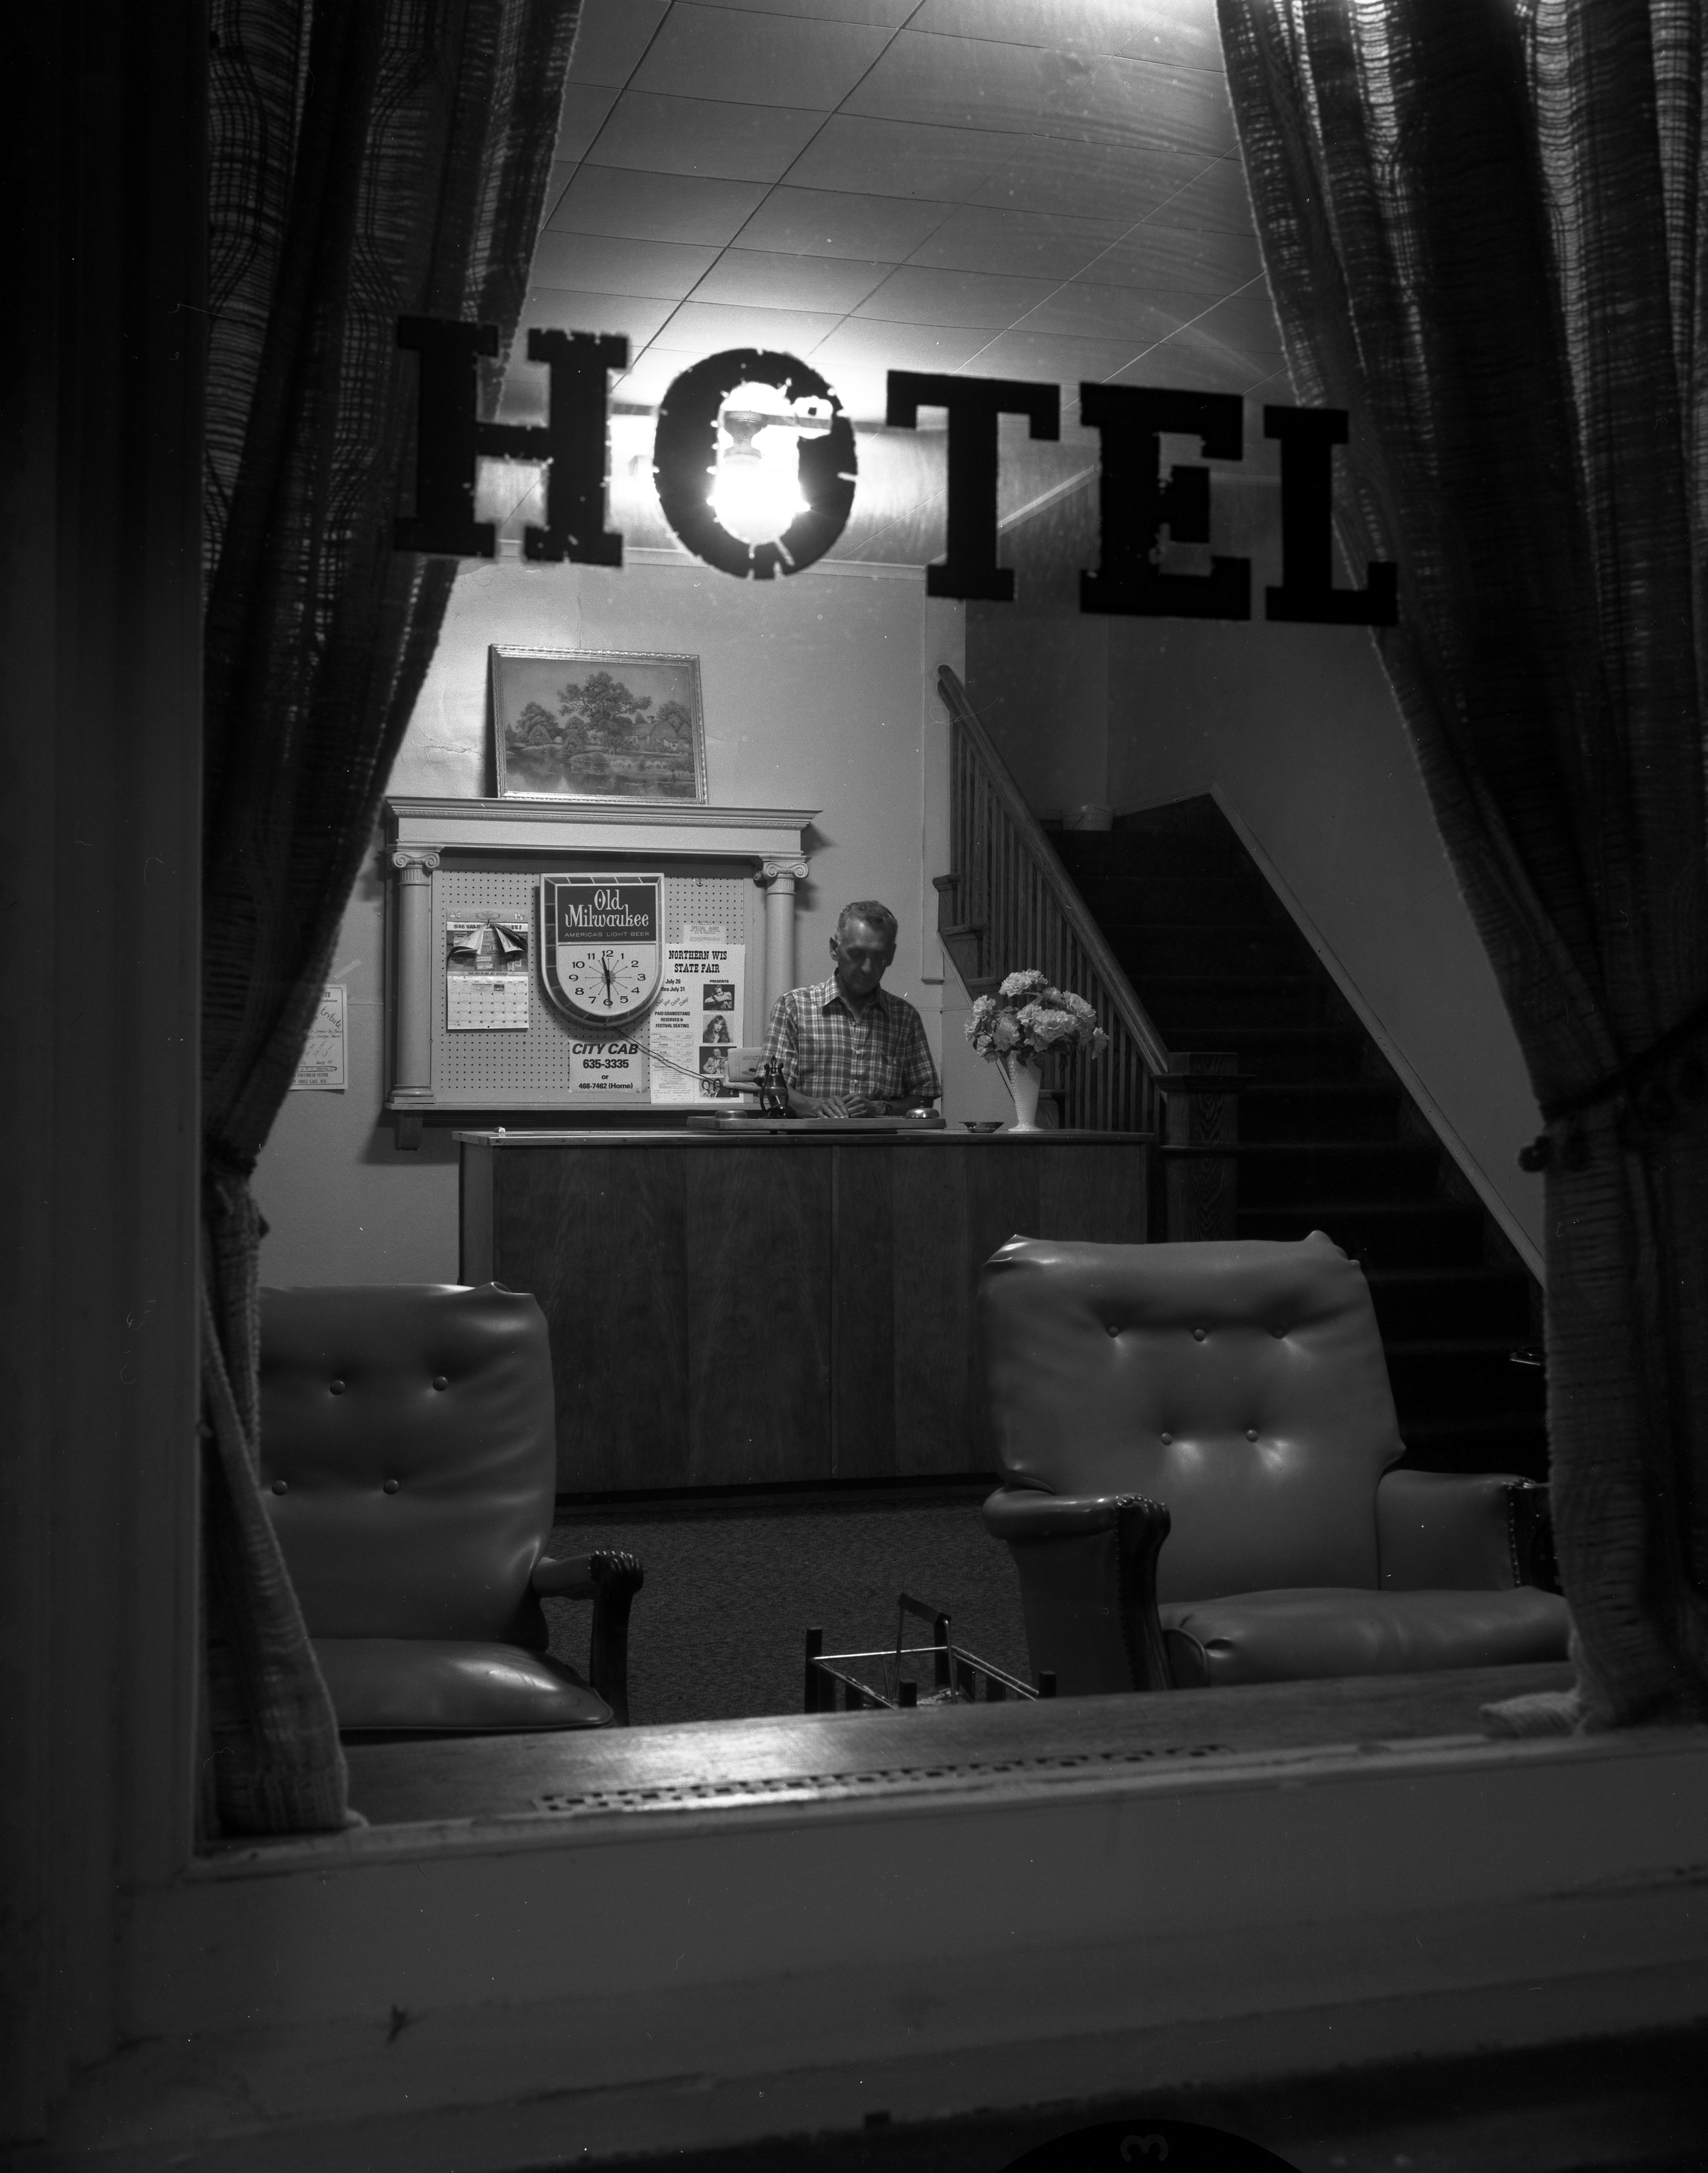 Frederick Hotel, Wisconsin